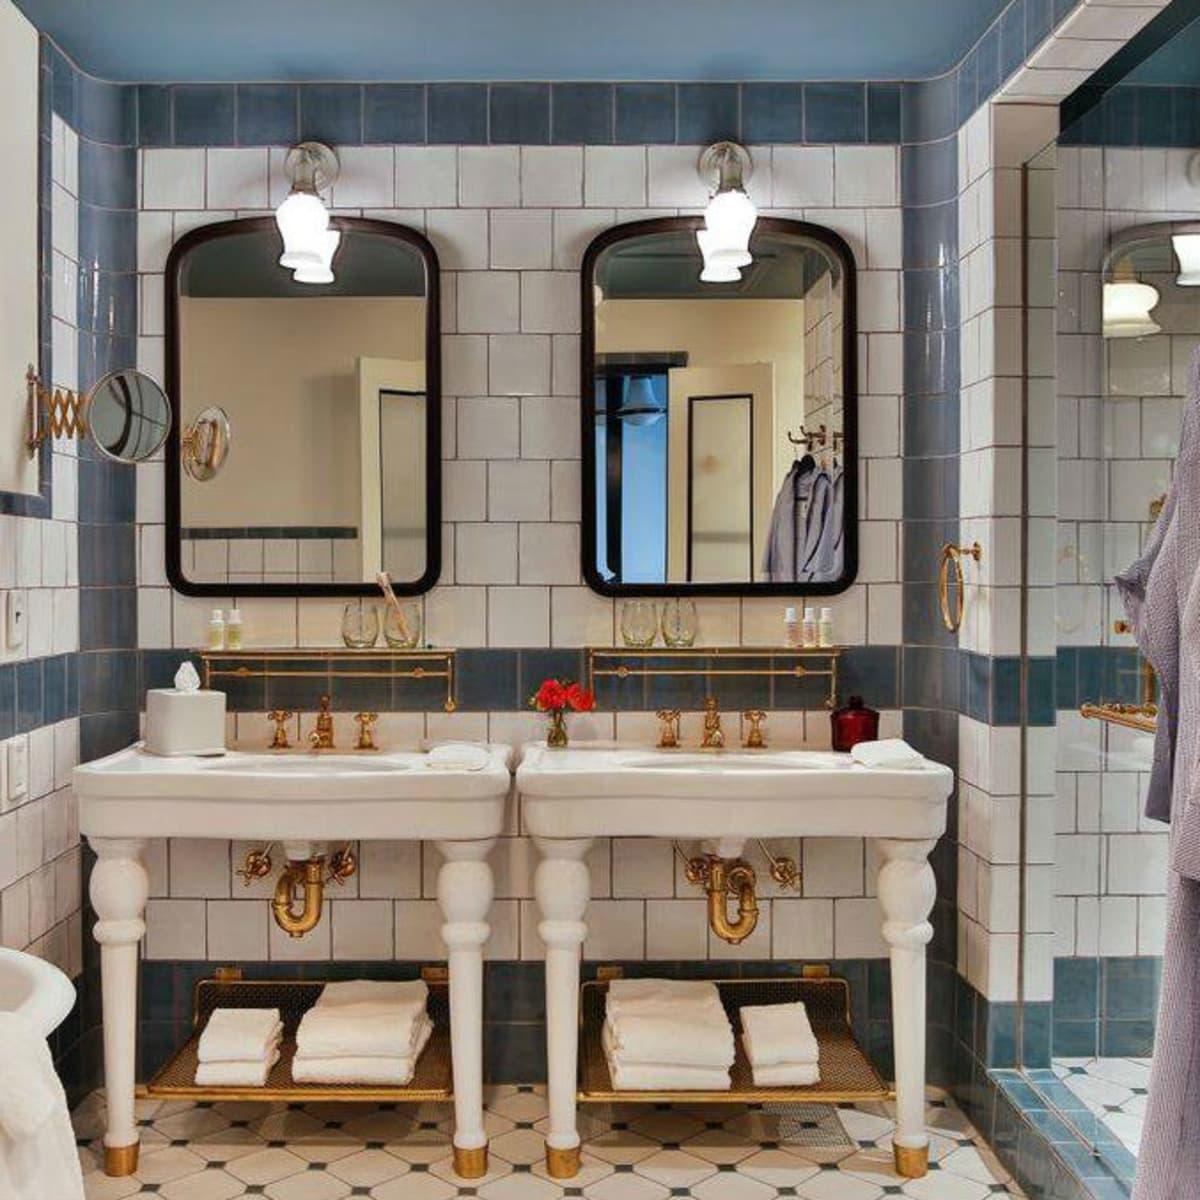 Hotel Emma bathroom